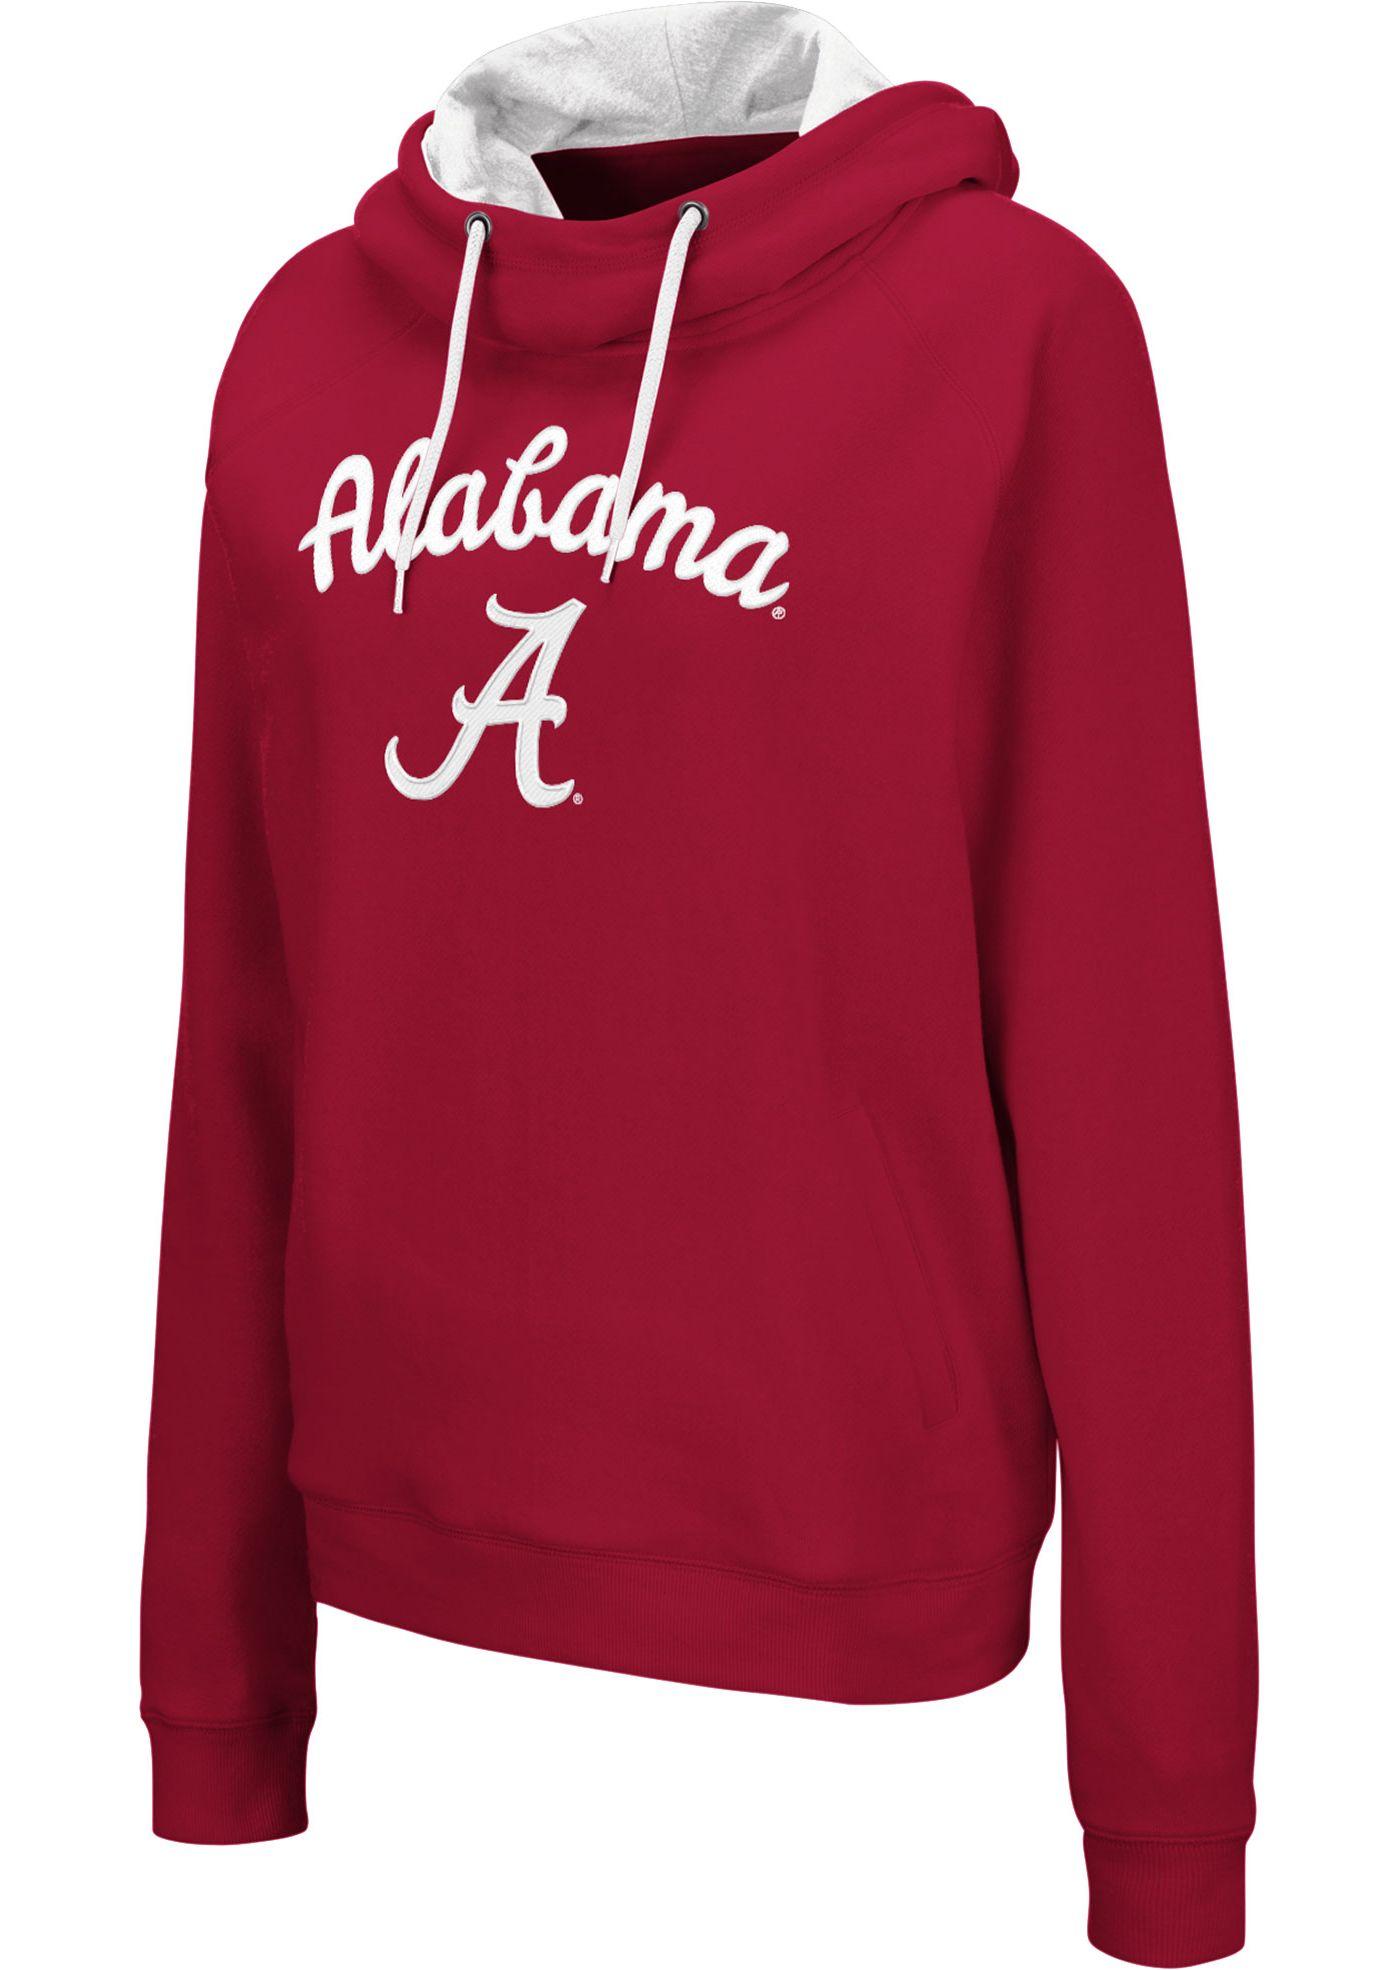 Colosseum Women's Alabama Crimson Tide Crimson Louise Pullover Sweatshirt